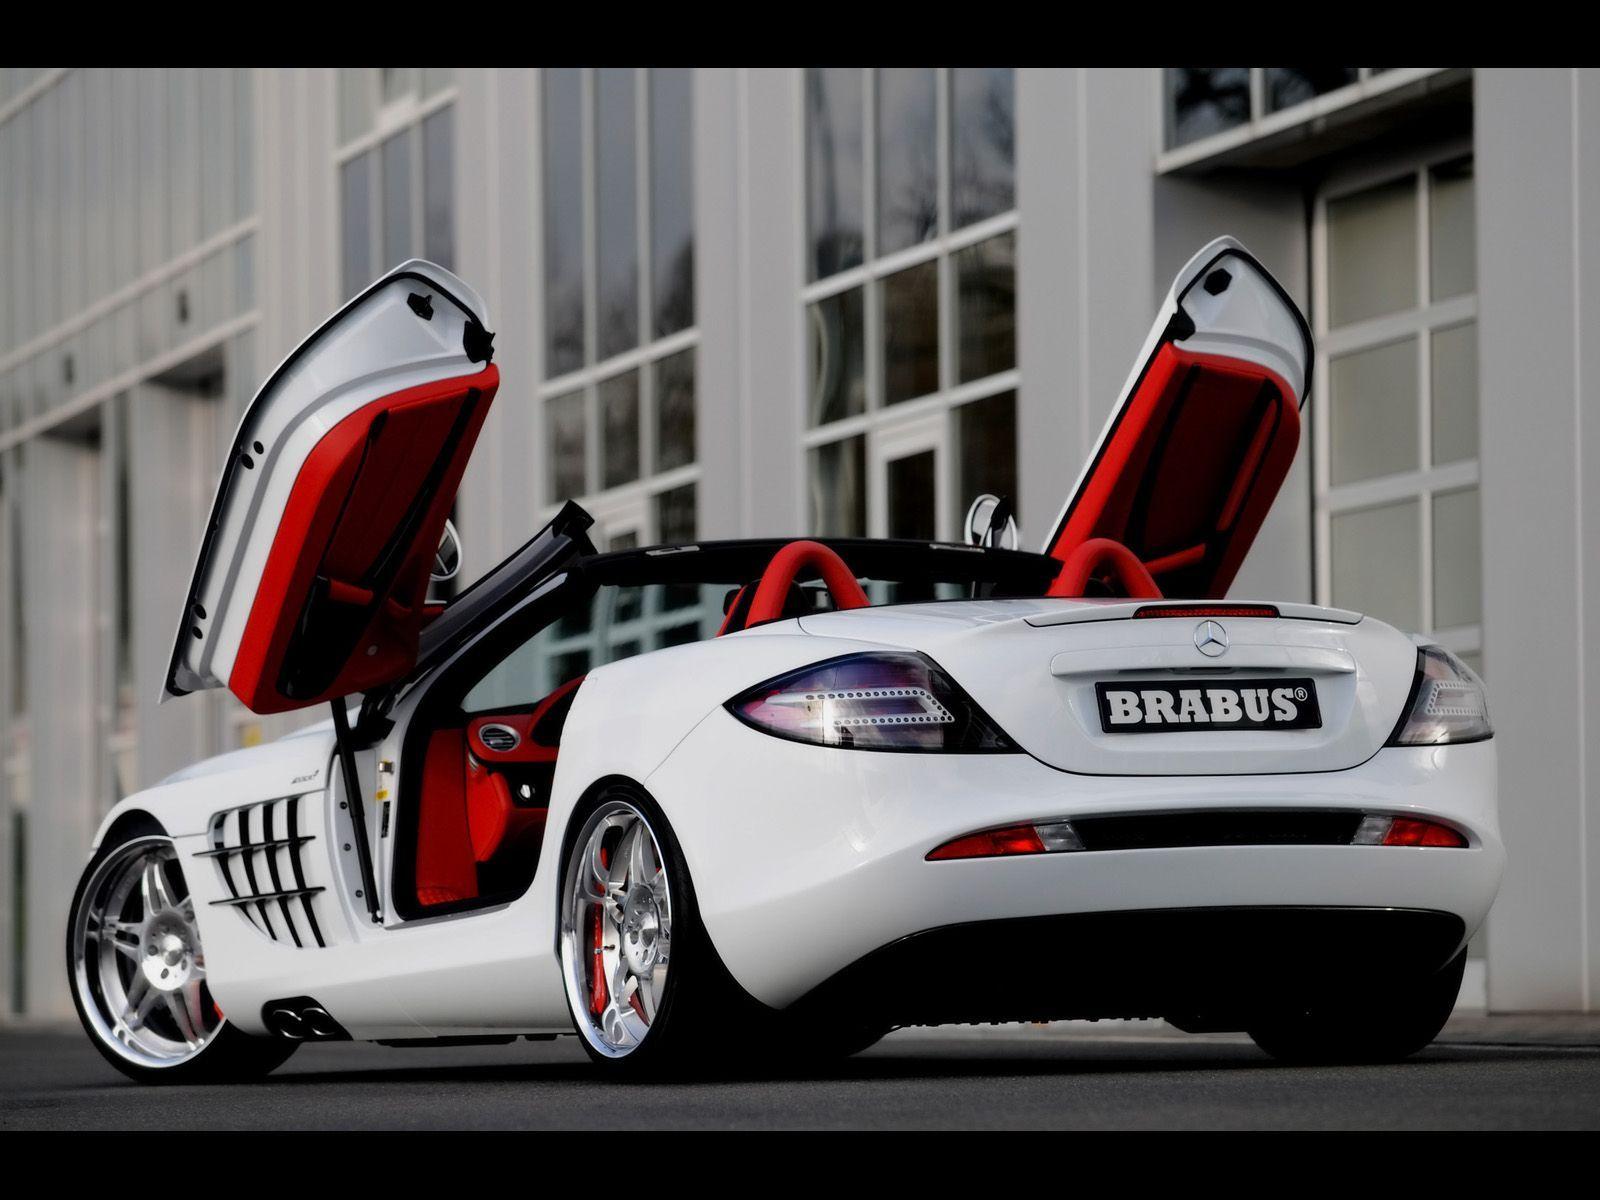 McLaren SLR Brabus